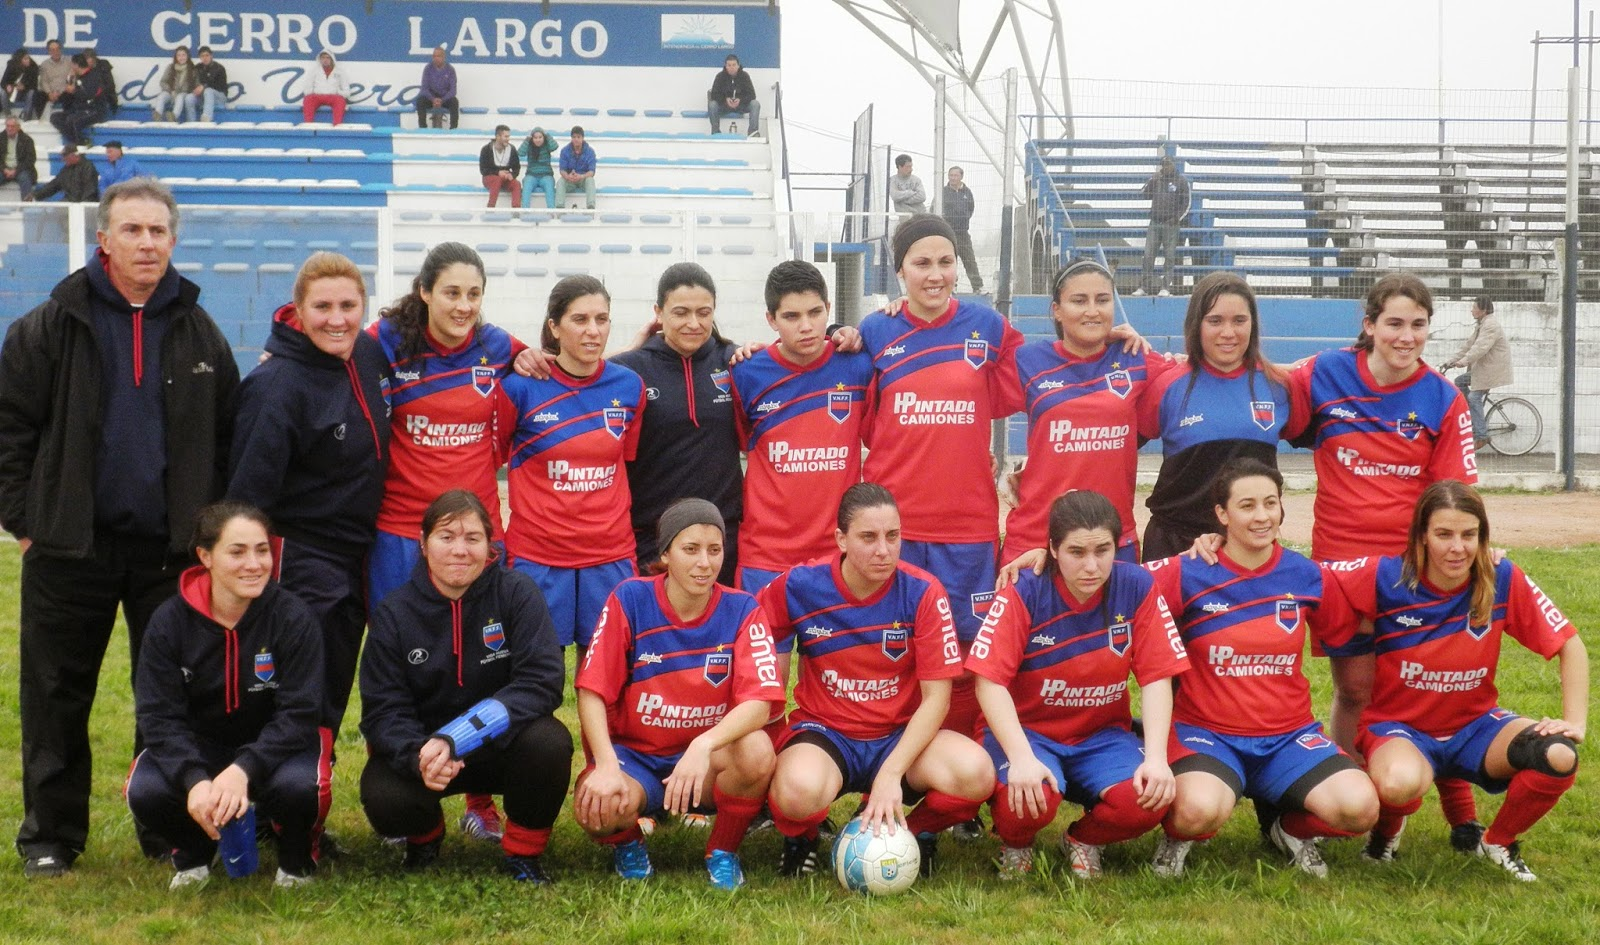 Yenifer de cerro largo uruguay 3 - 1 6